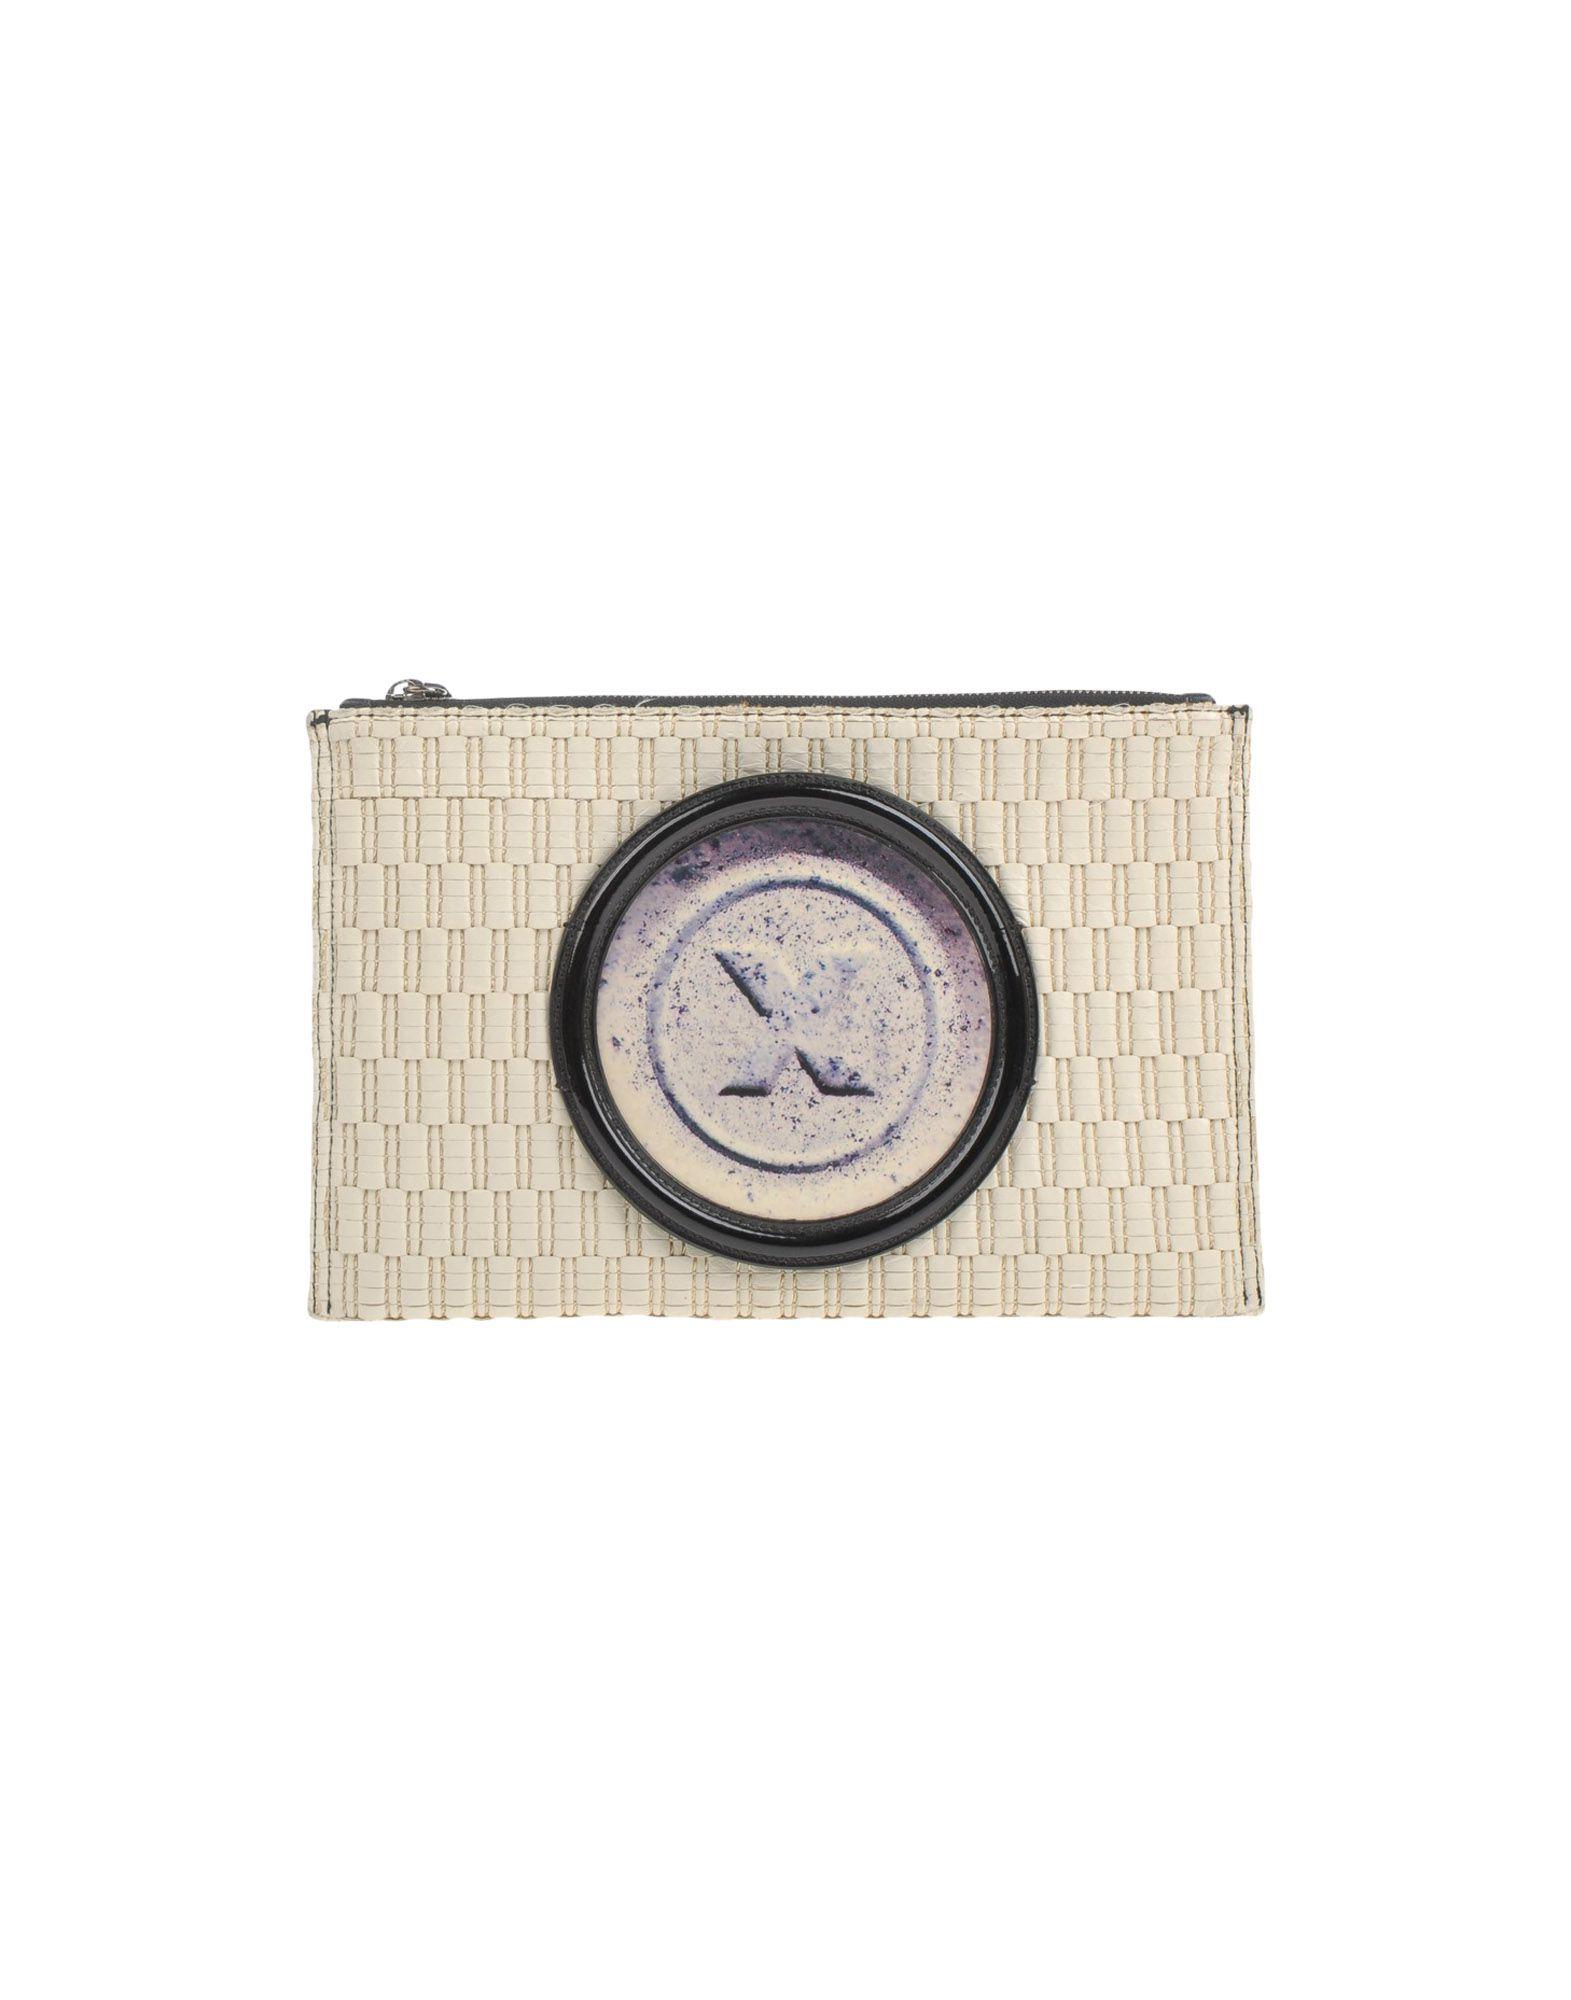 THOMAS BLAKK Handbag in Ivory